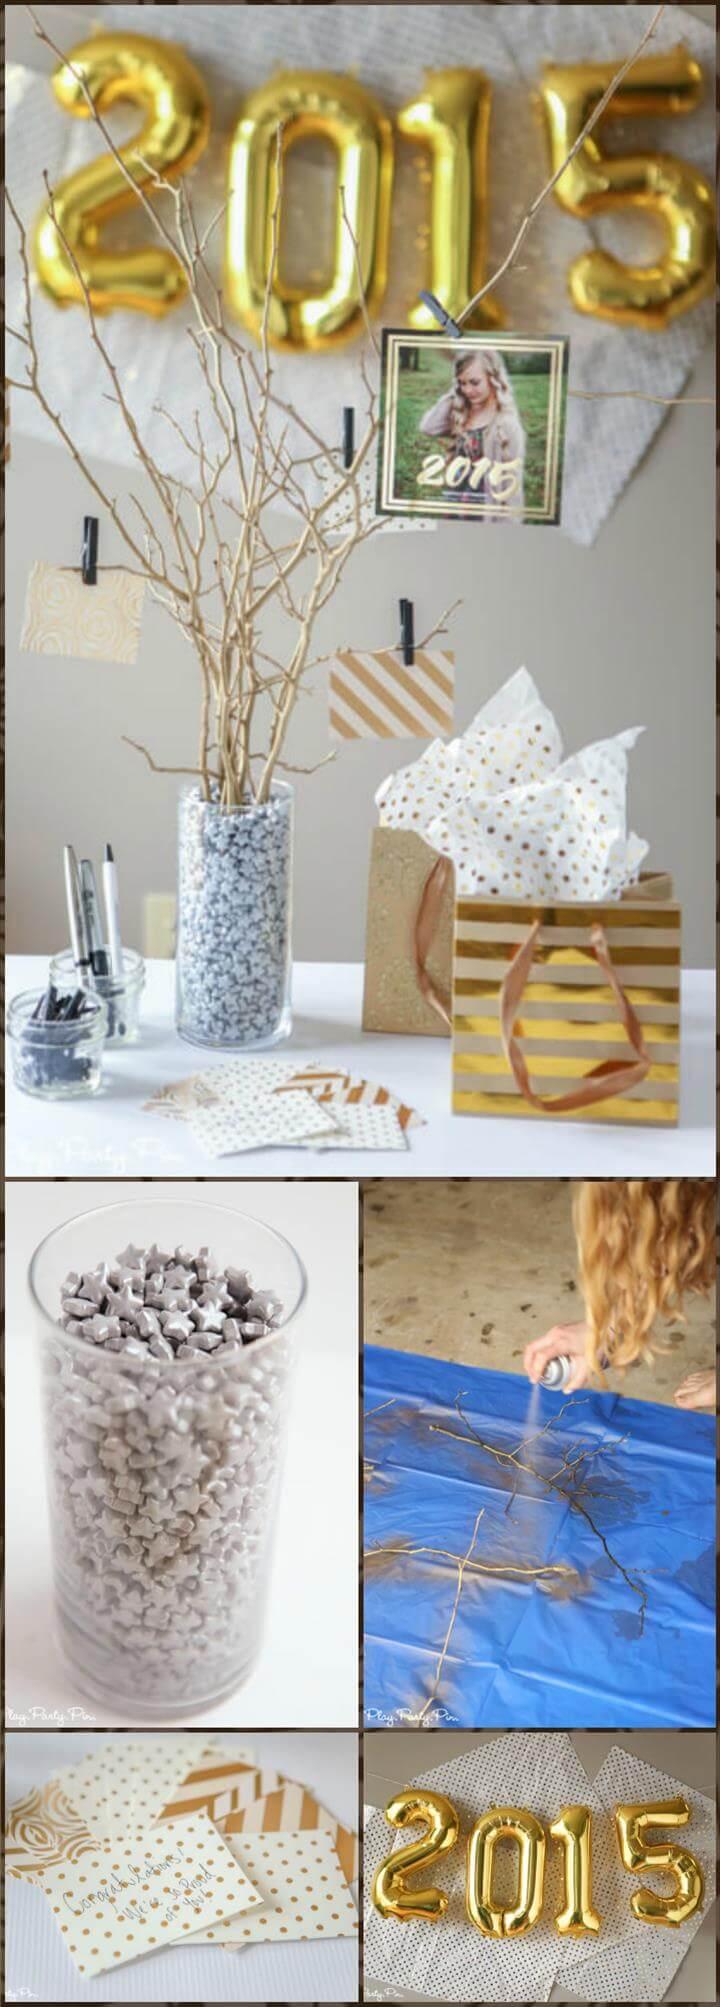 50+ DIY Graduation Party Ideas & Decorations - Page 3 of 4 ...